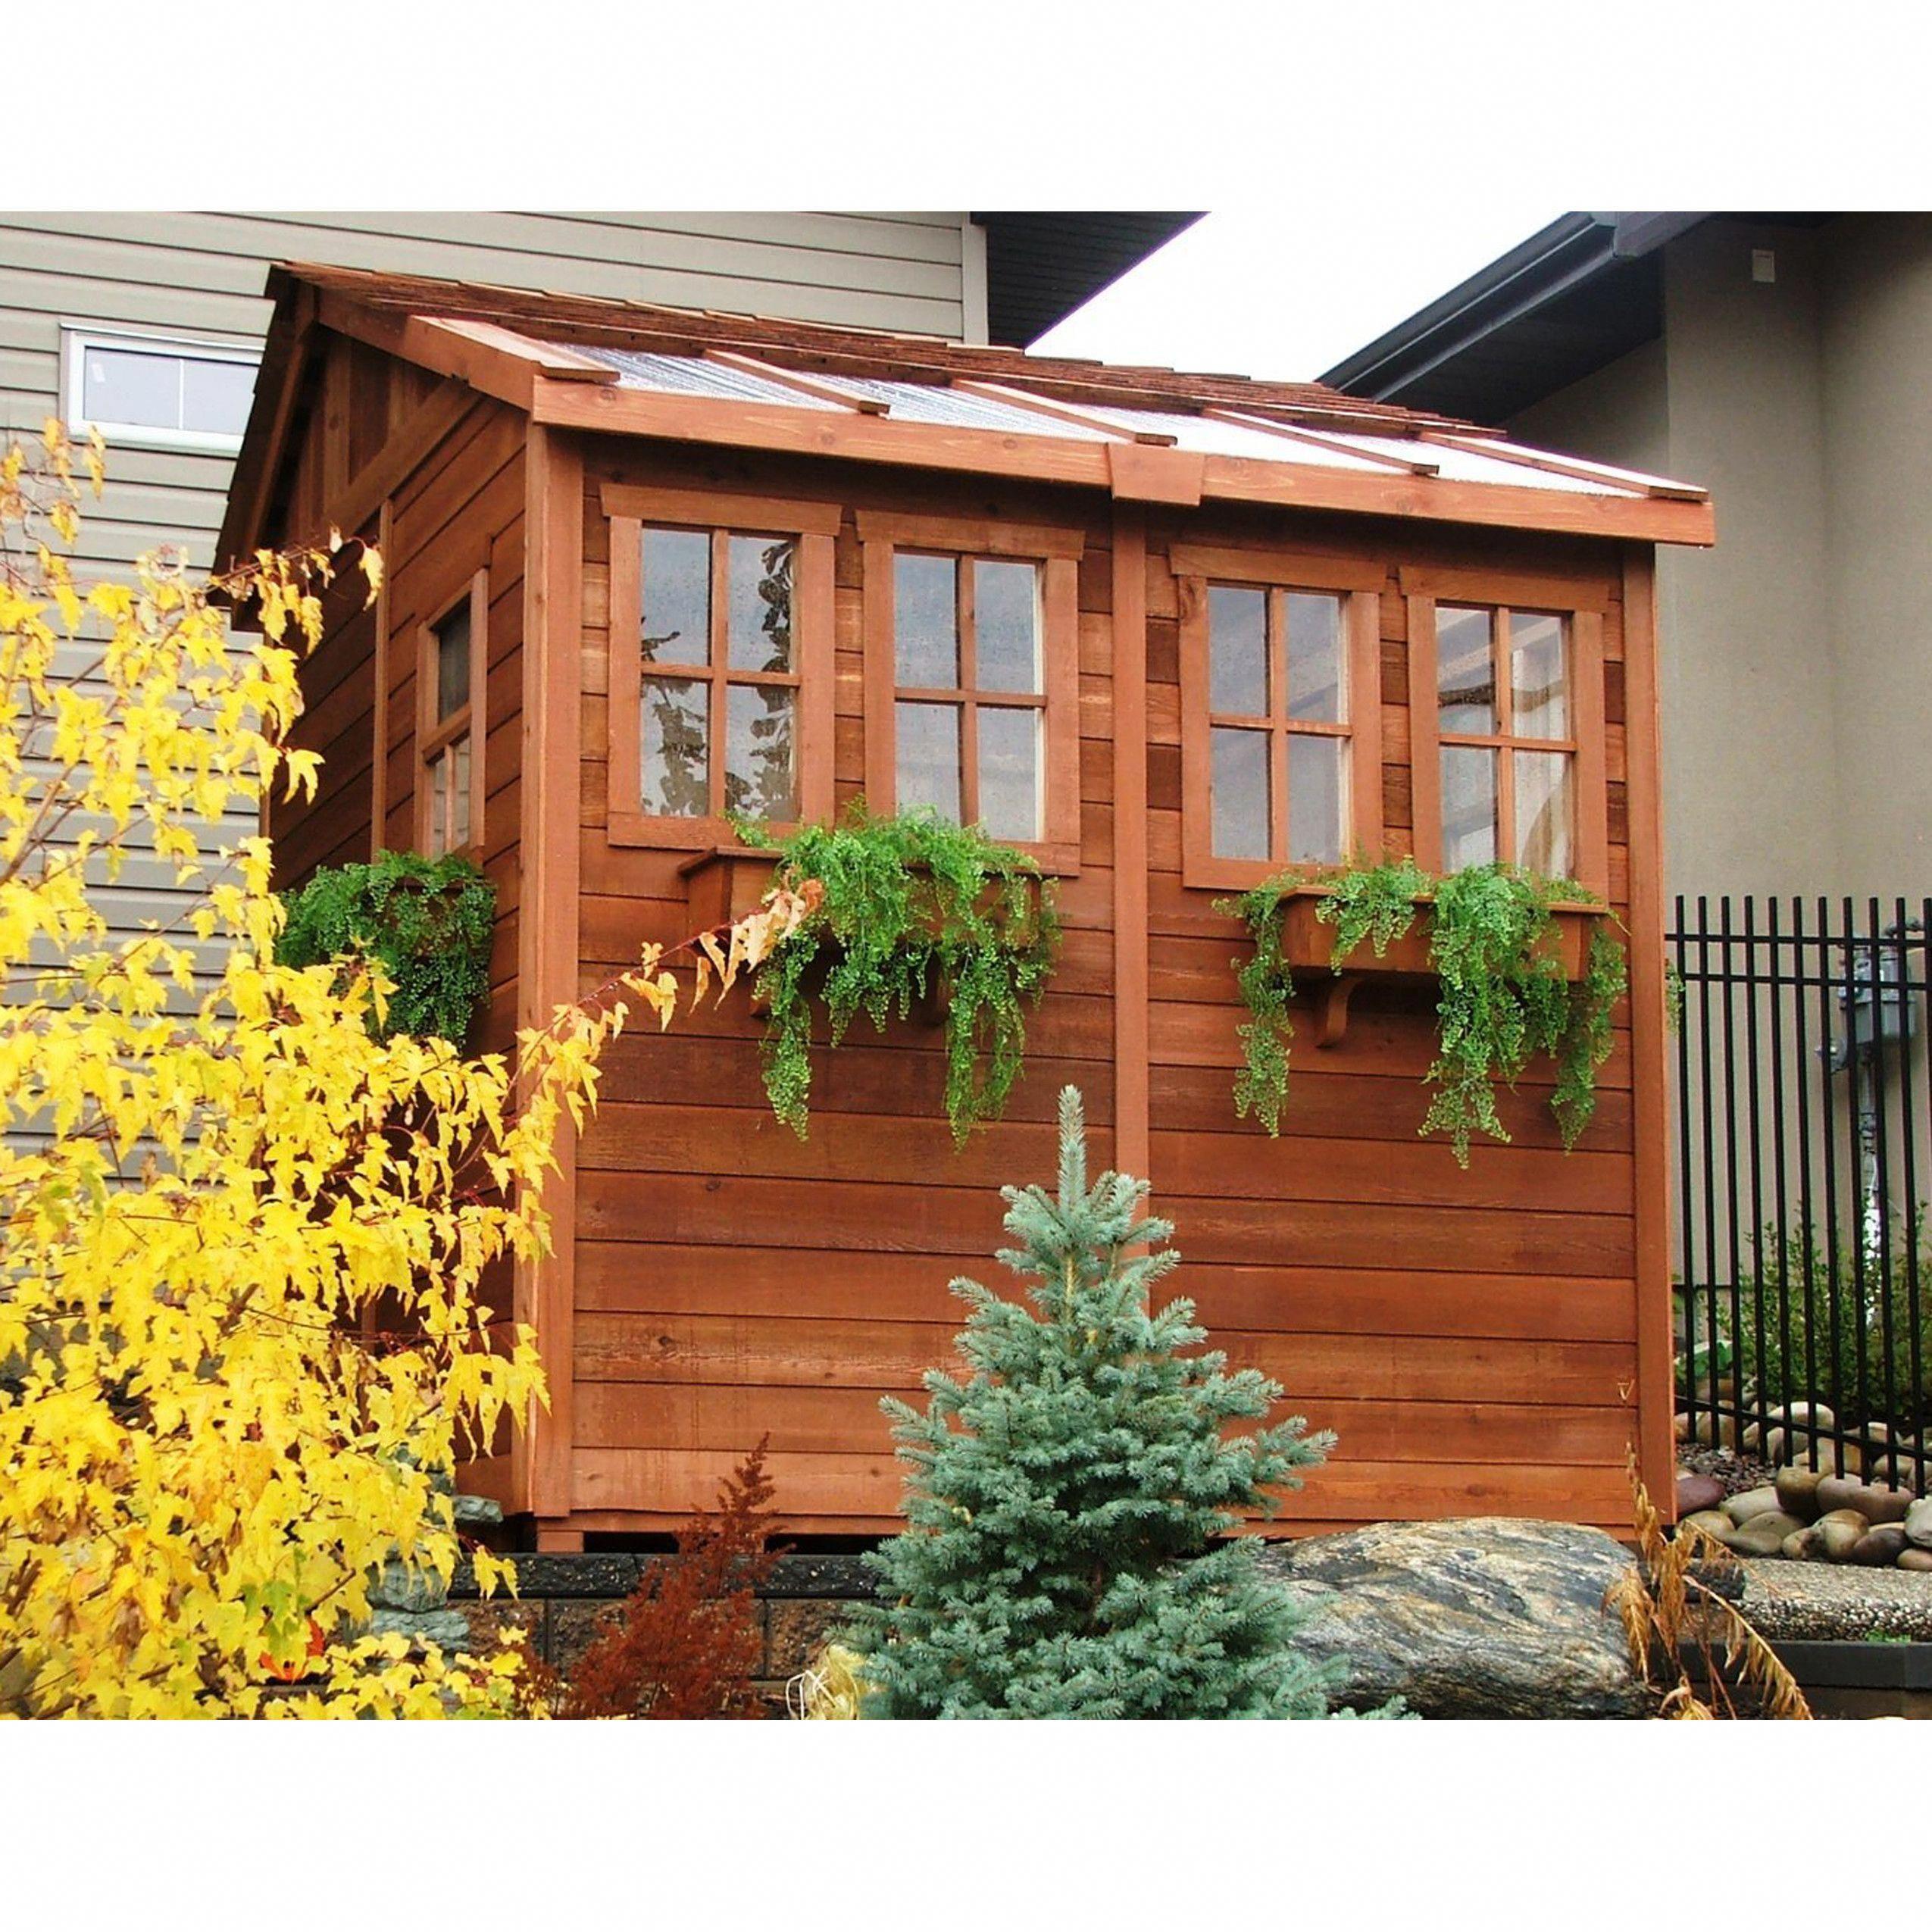 Pergola Builders Near Me #PergolaLatticeRoof Info ... on Outdoor Living Contractors Near Me id=15583